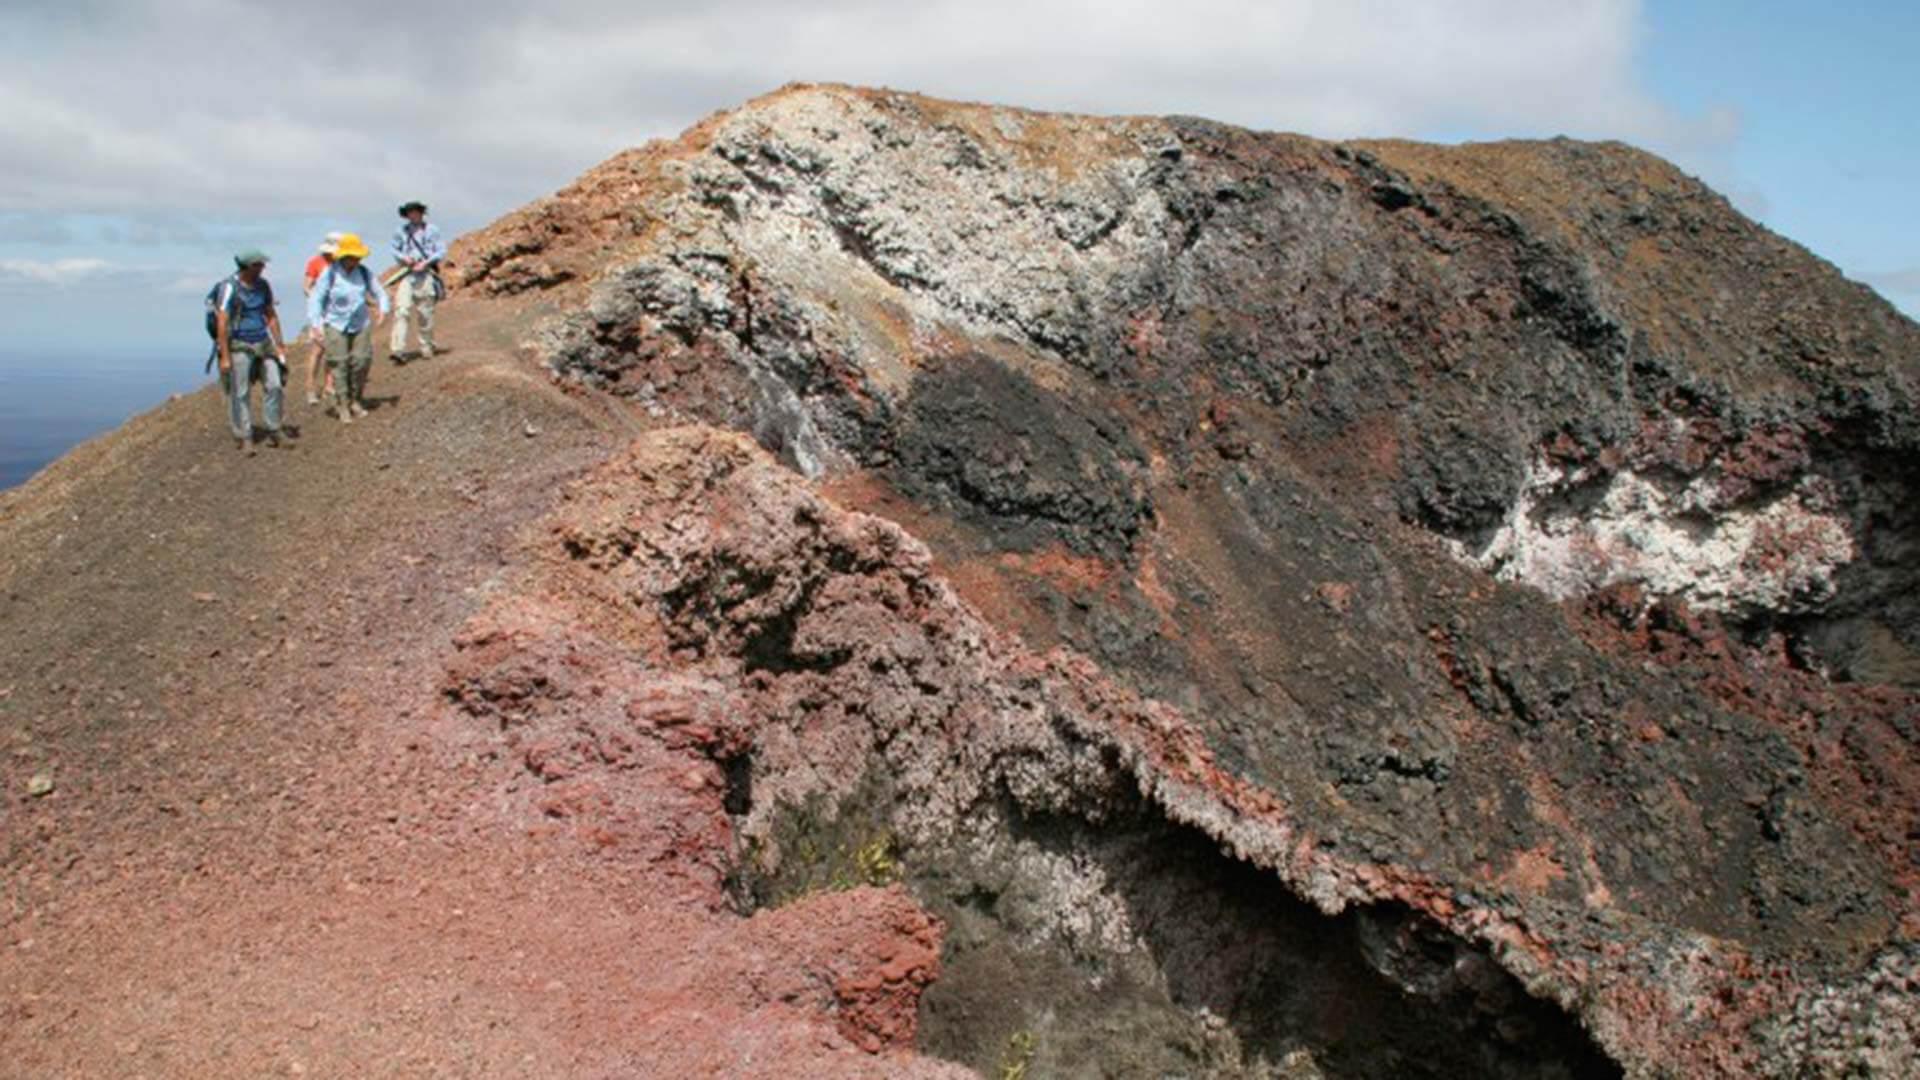 visit to volcan chico sierra negra isabela galapagos